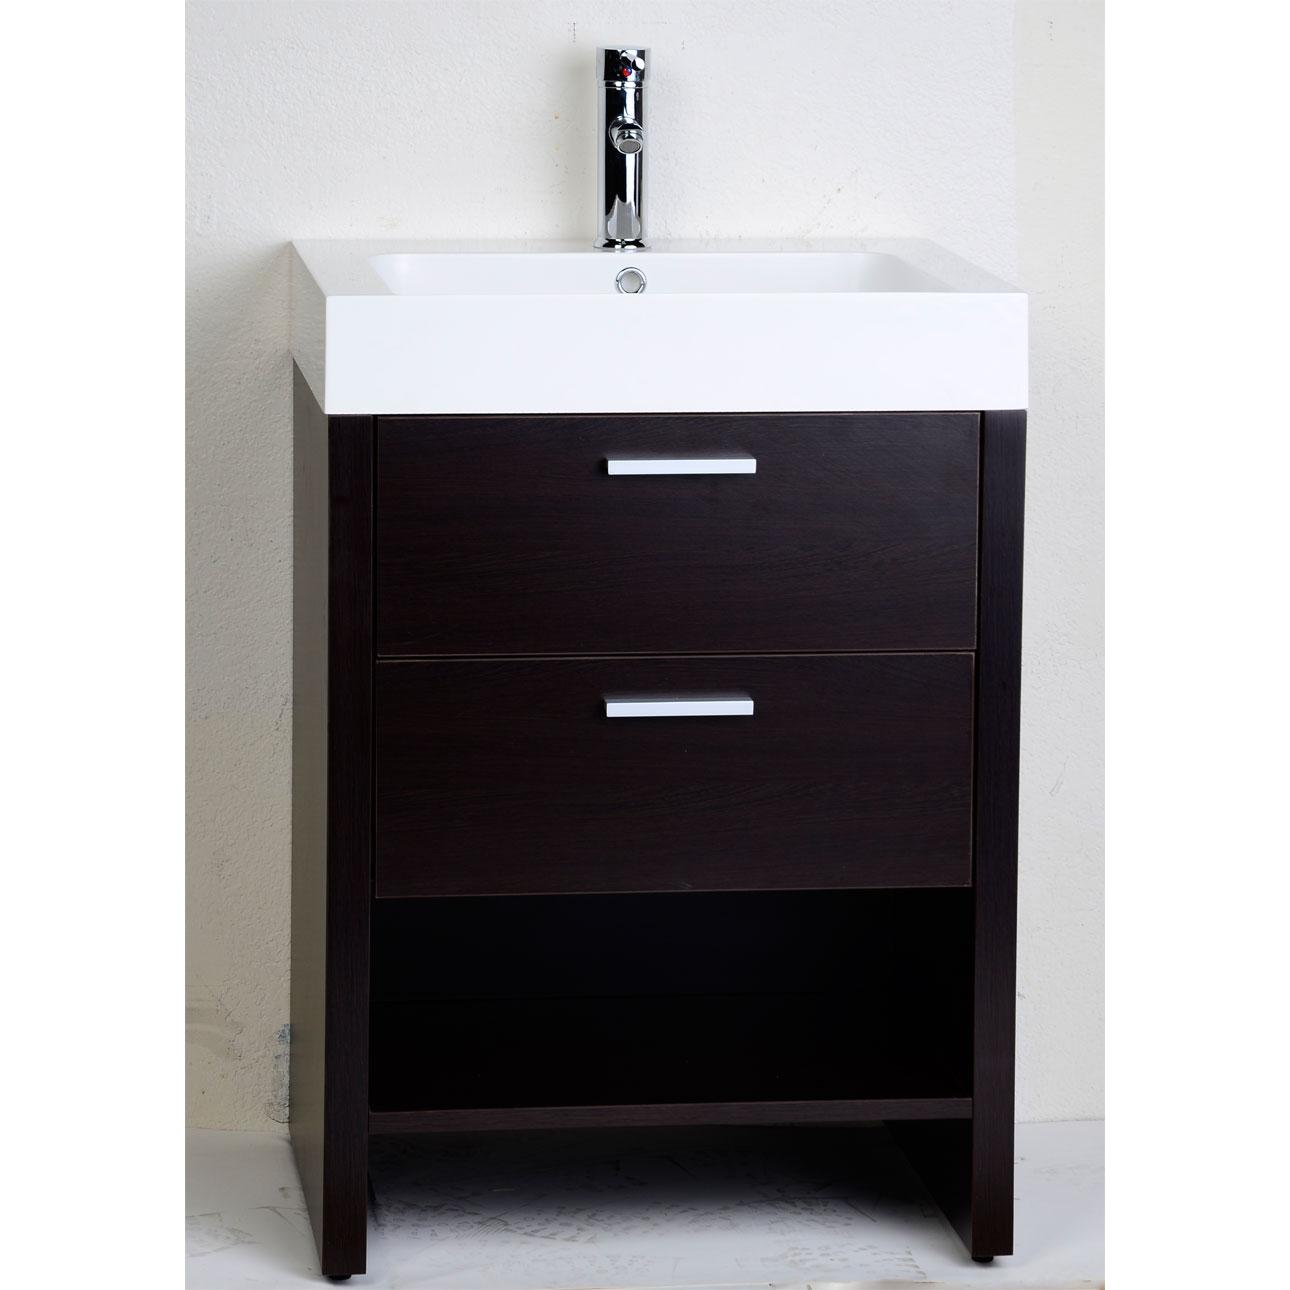 24 Inch Vanity 24 Lander Vanity White Bathroom. 24 Everett Vessel Sink  Vanity Black Bathroom. 24 Lander Vanity White Bathroom. - Archives